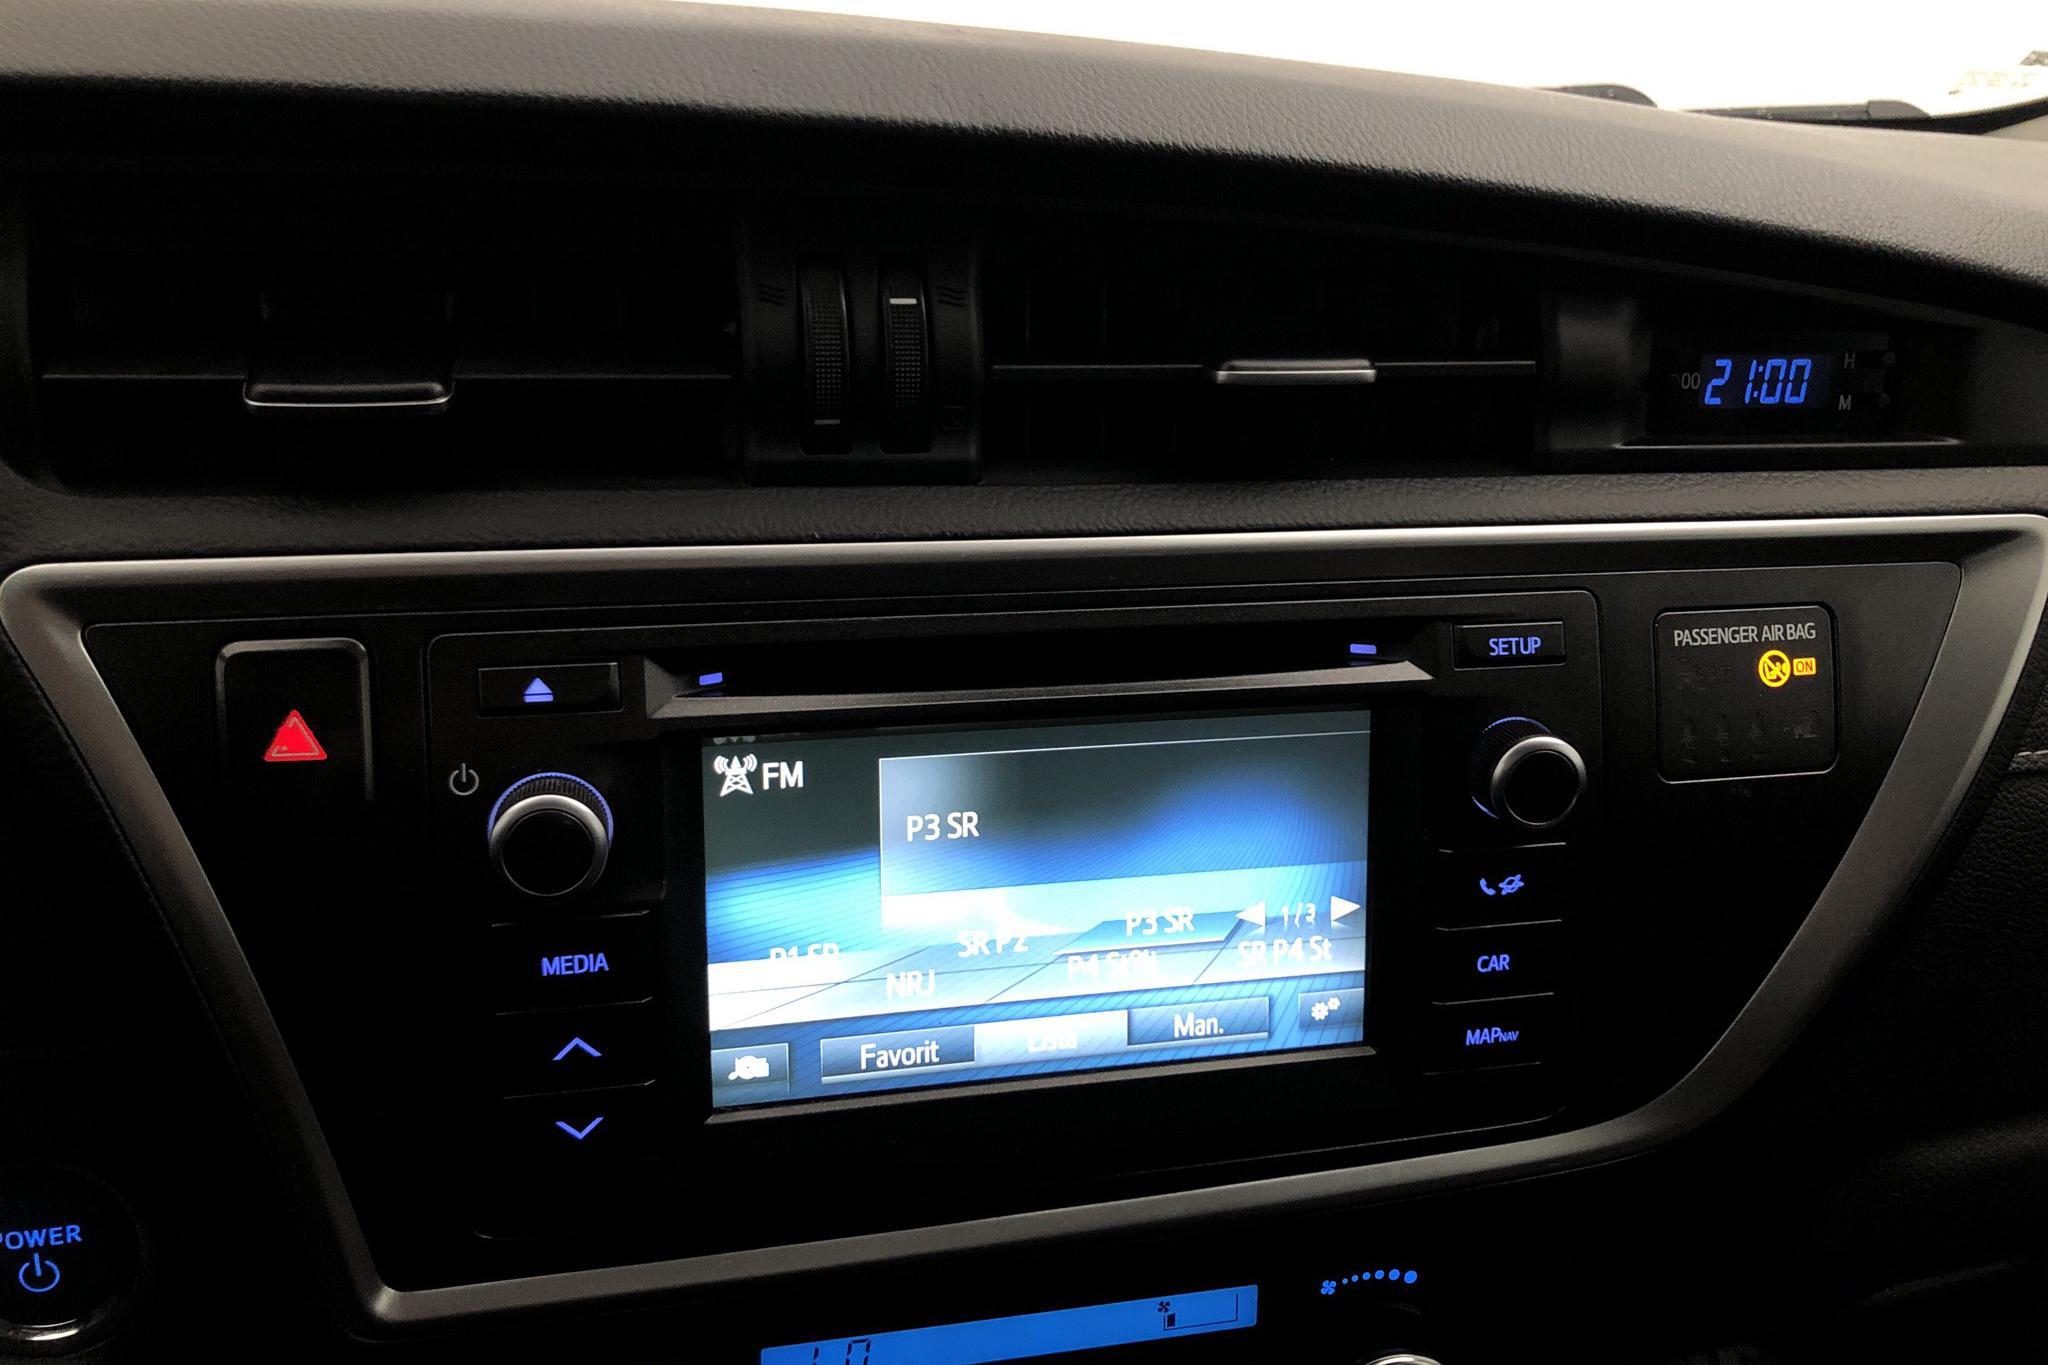 Toyota Auris 1.8 HSD Touring Sports (99hk) - 17 992 mil - Automat - svart - 2015